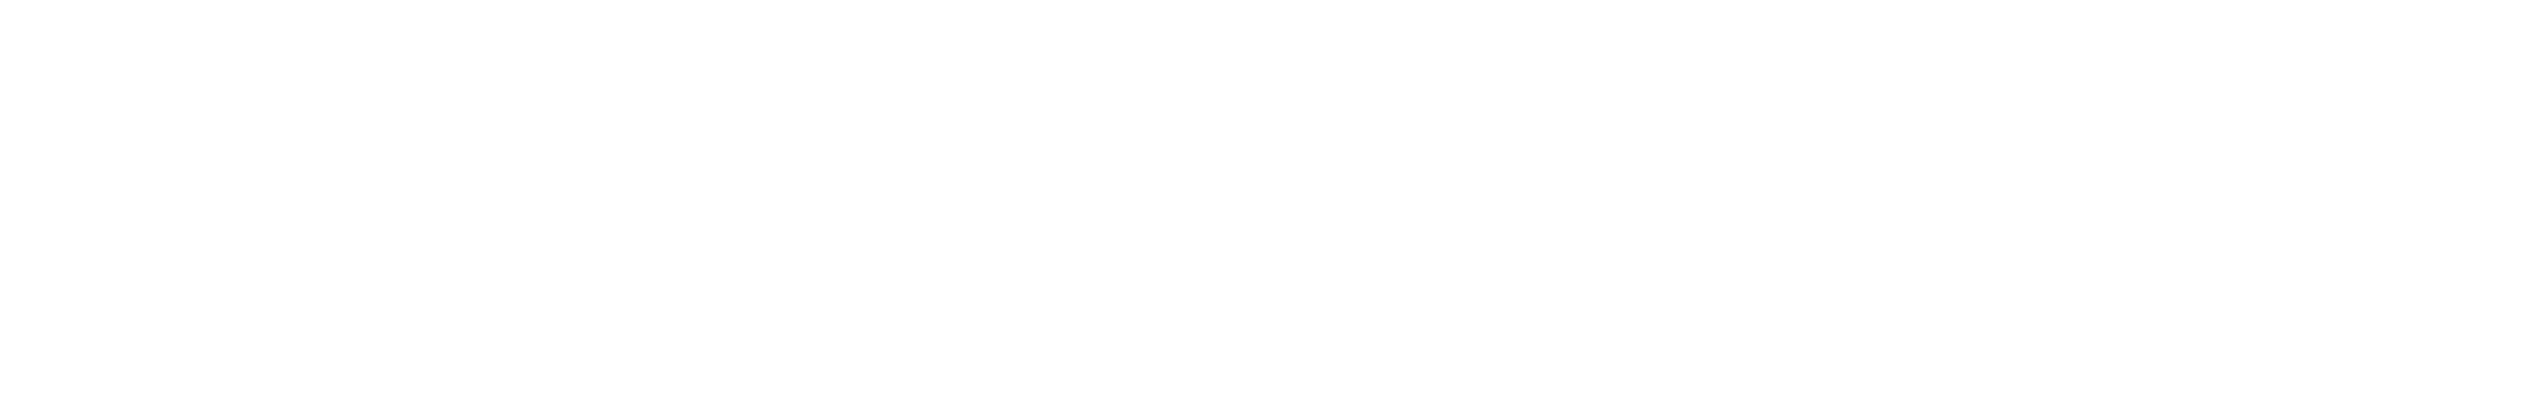 monobank asa aksjekurs miele shop rabattcode